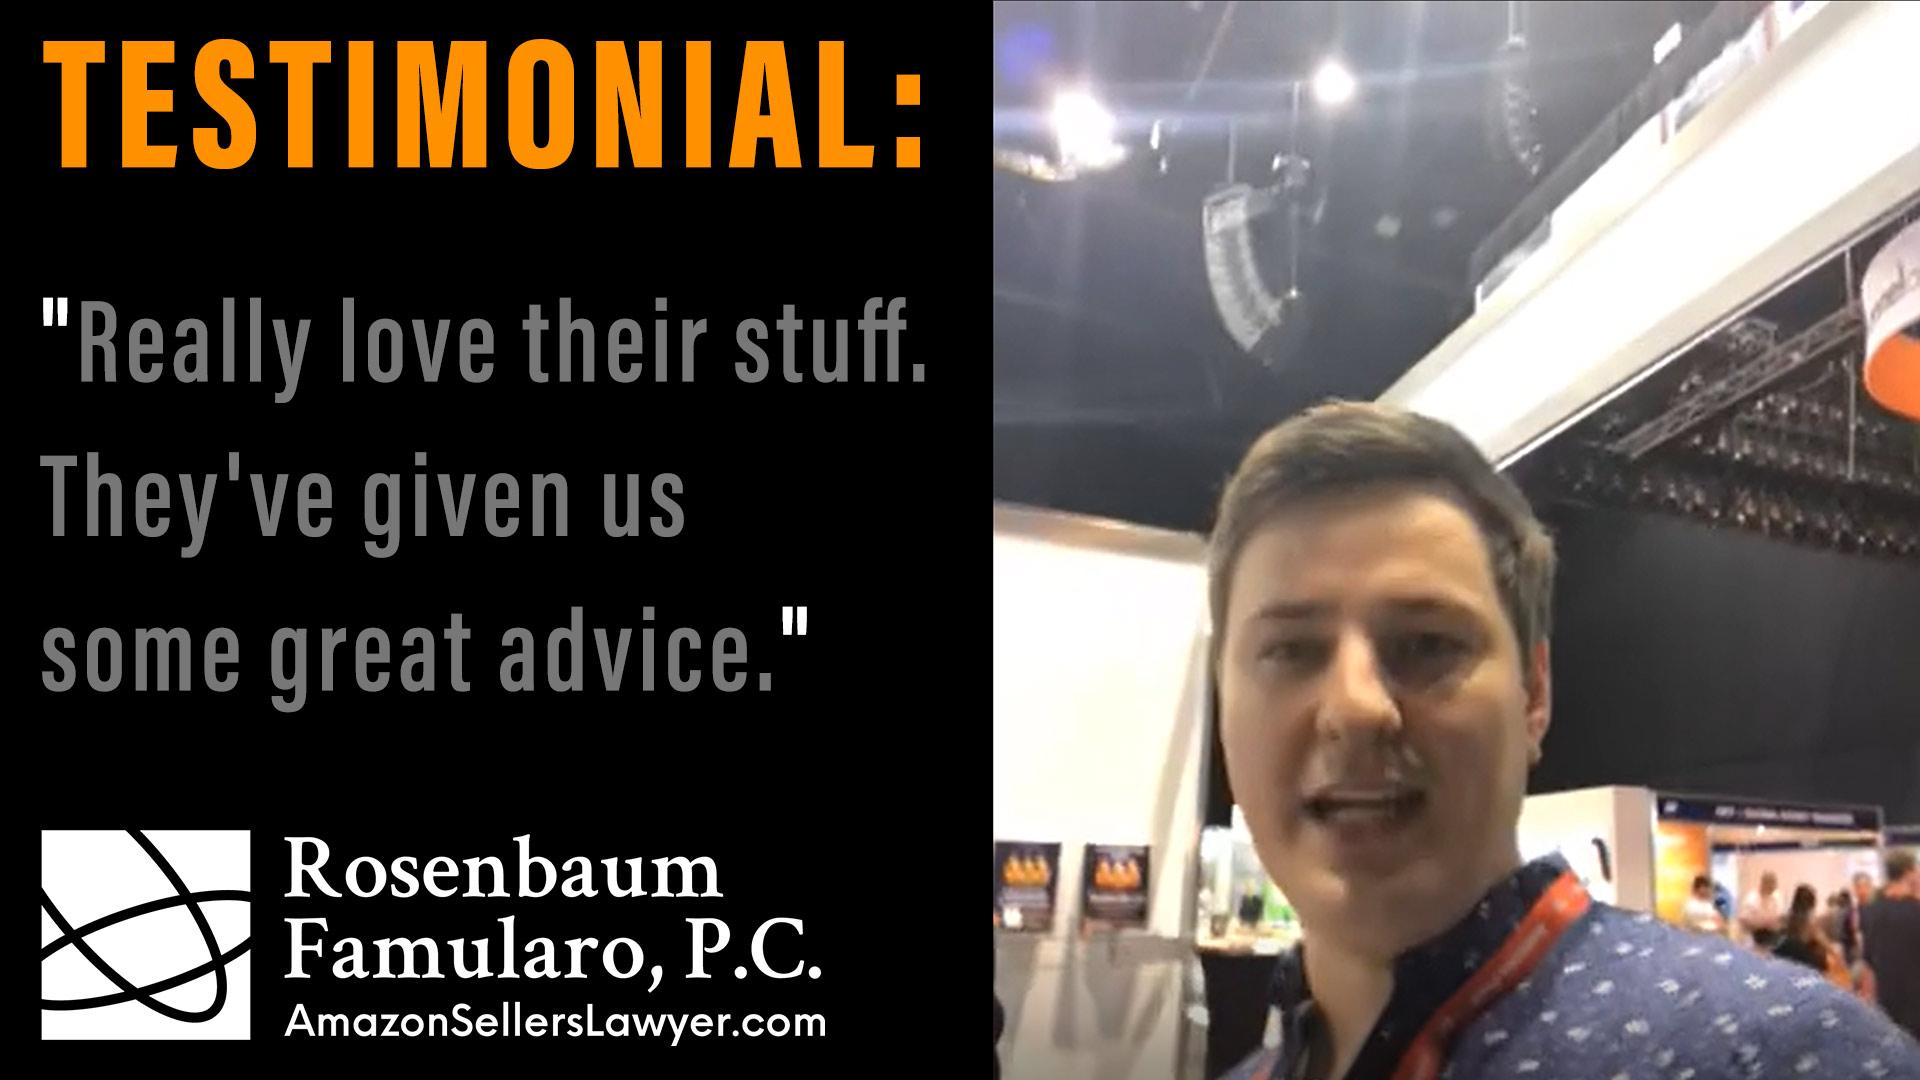 AmazonSellersLawyer testimonials High Recommend CJ Rosenbaum